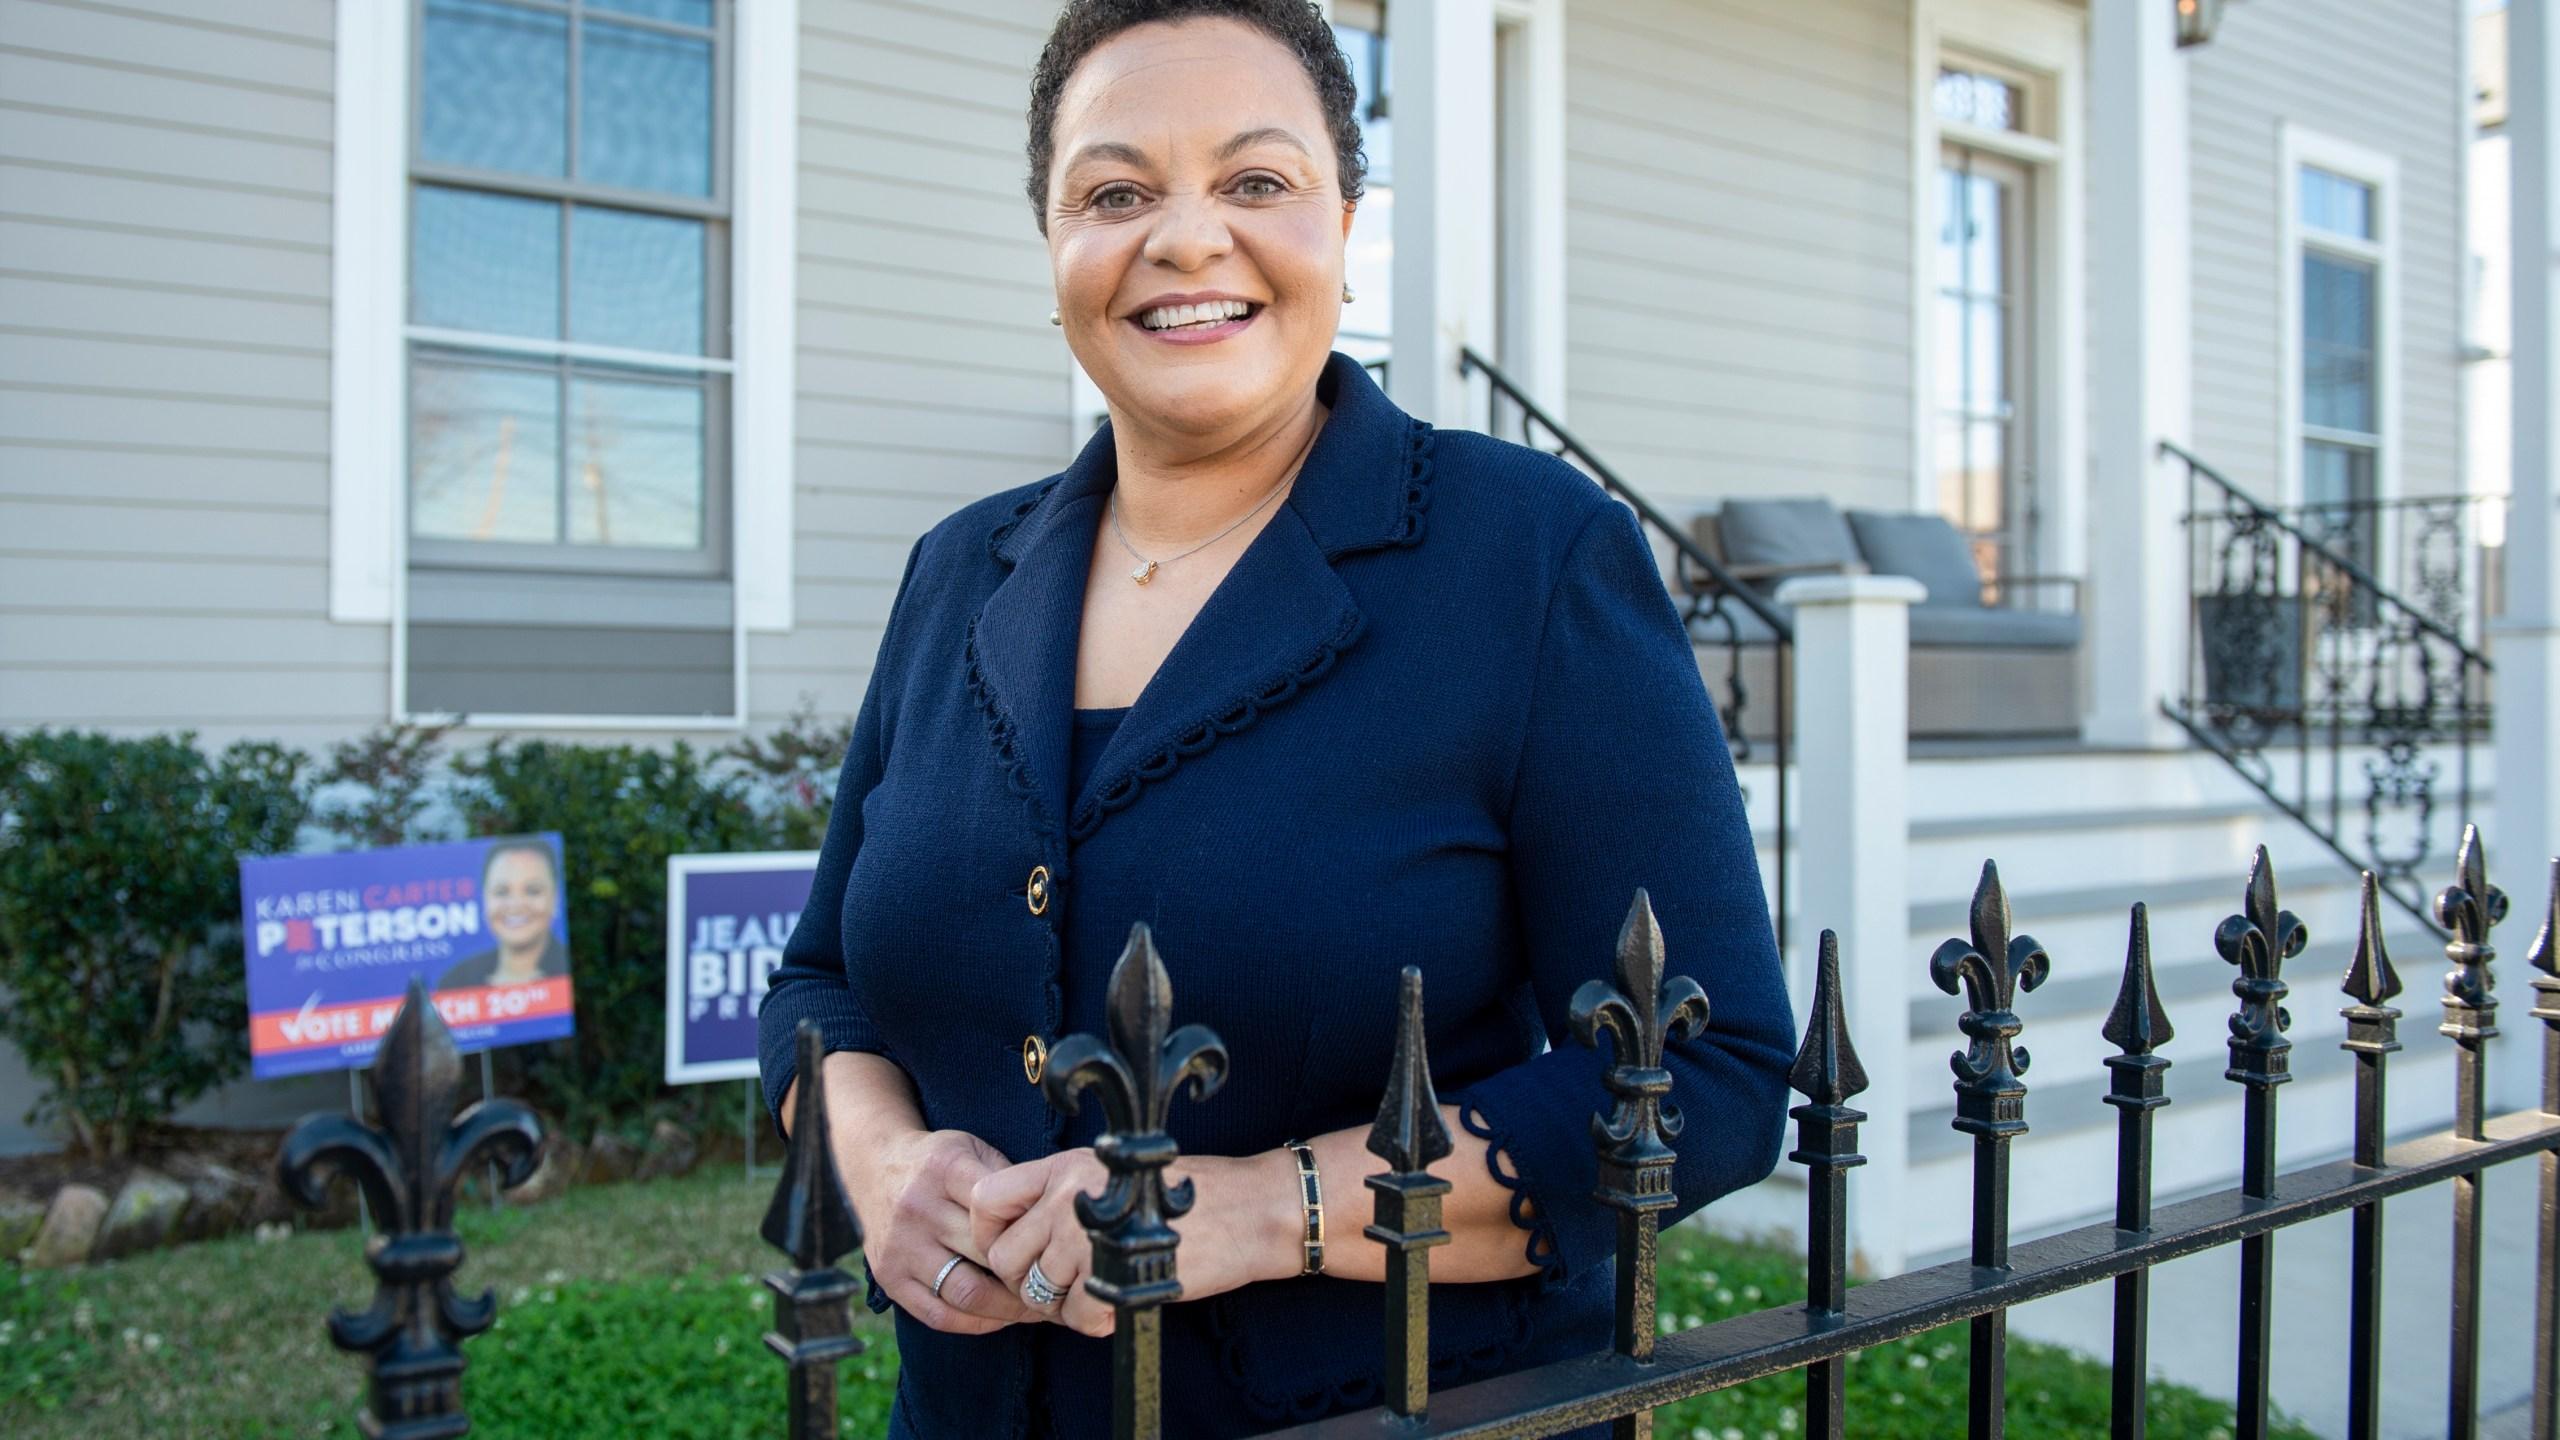 Karen Carter Peterson